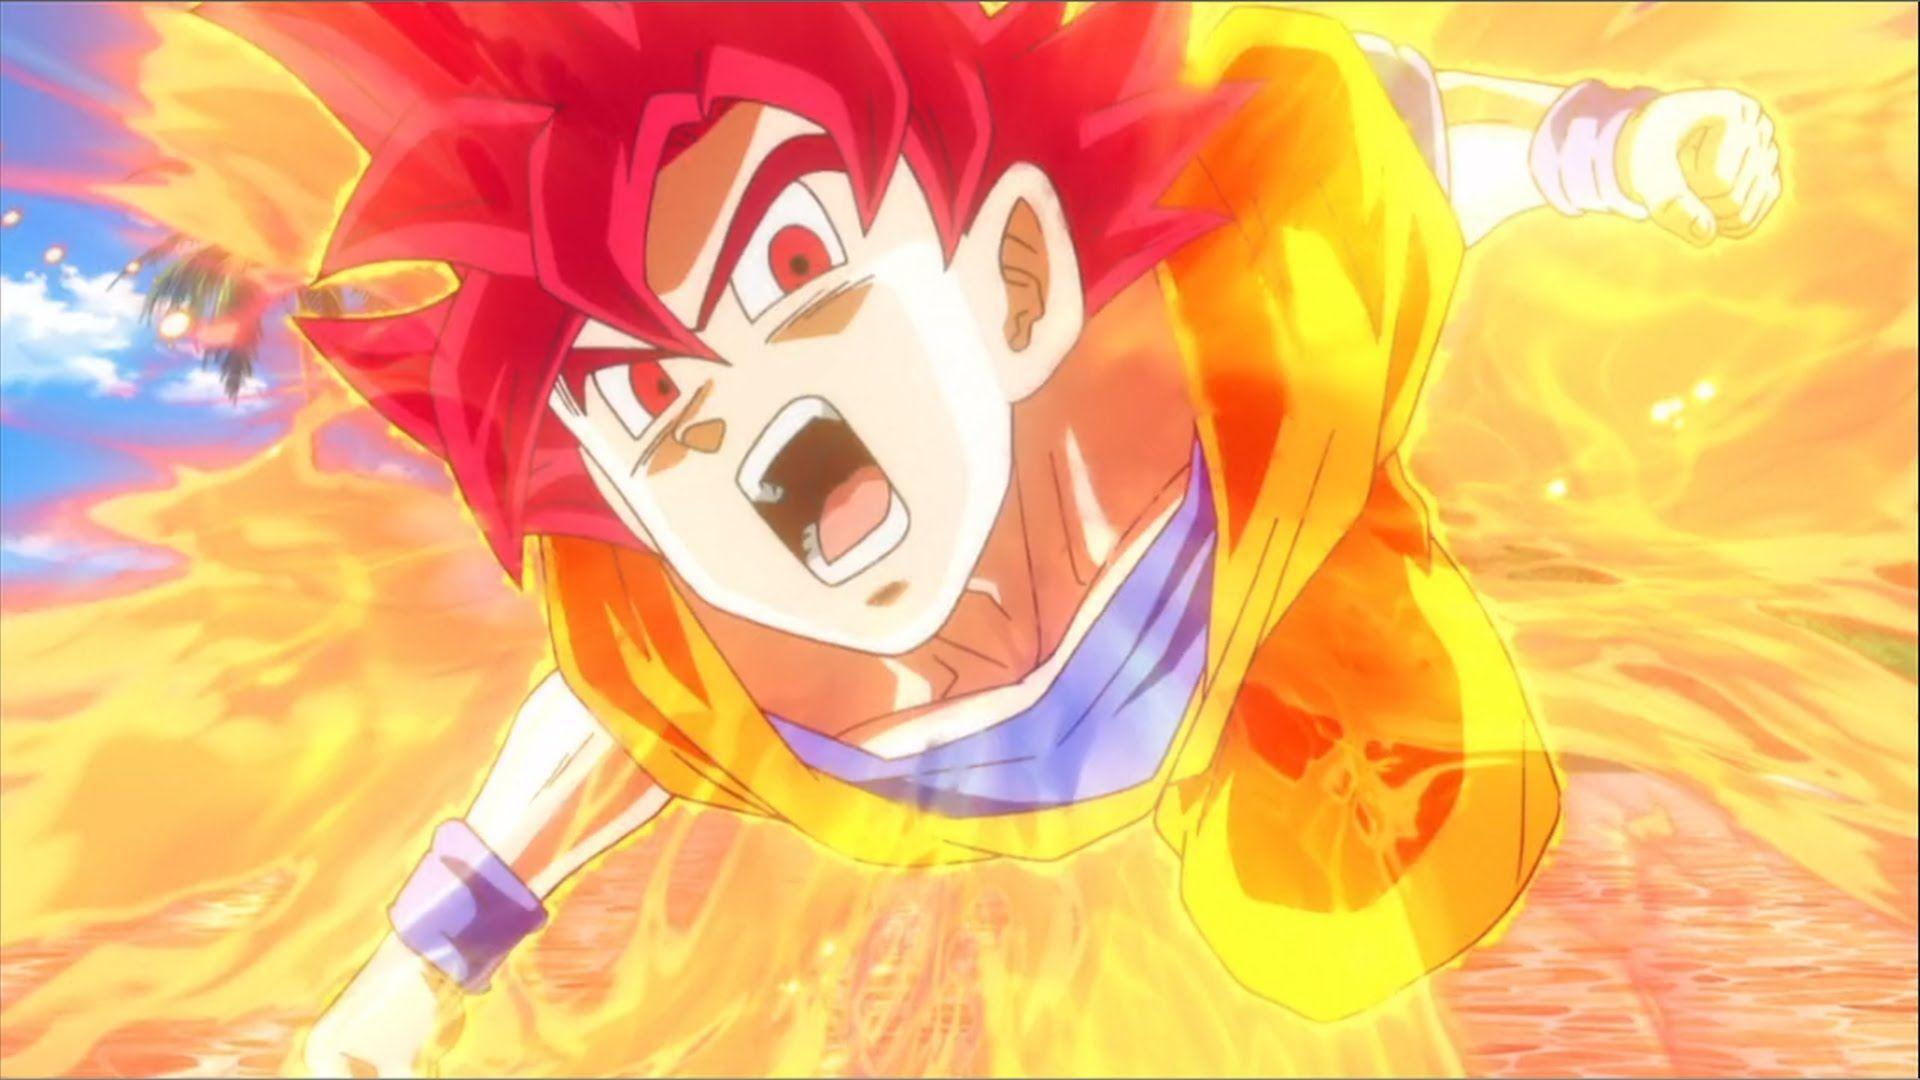 Free Download Son Goku Super Saiyan God Wallpaper Anime Goku Super